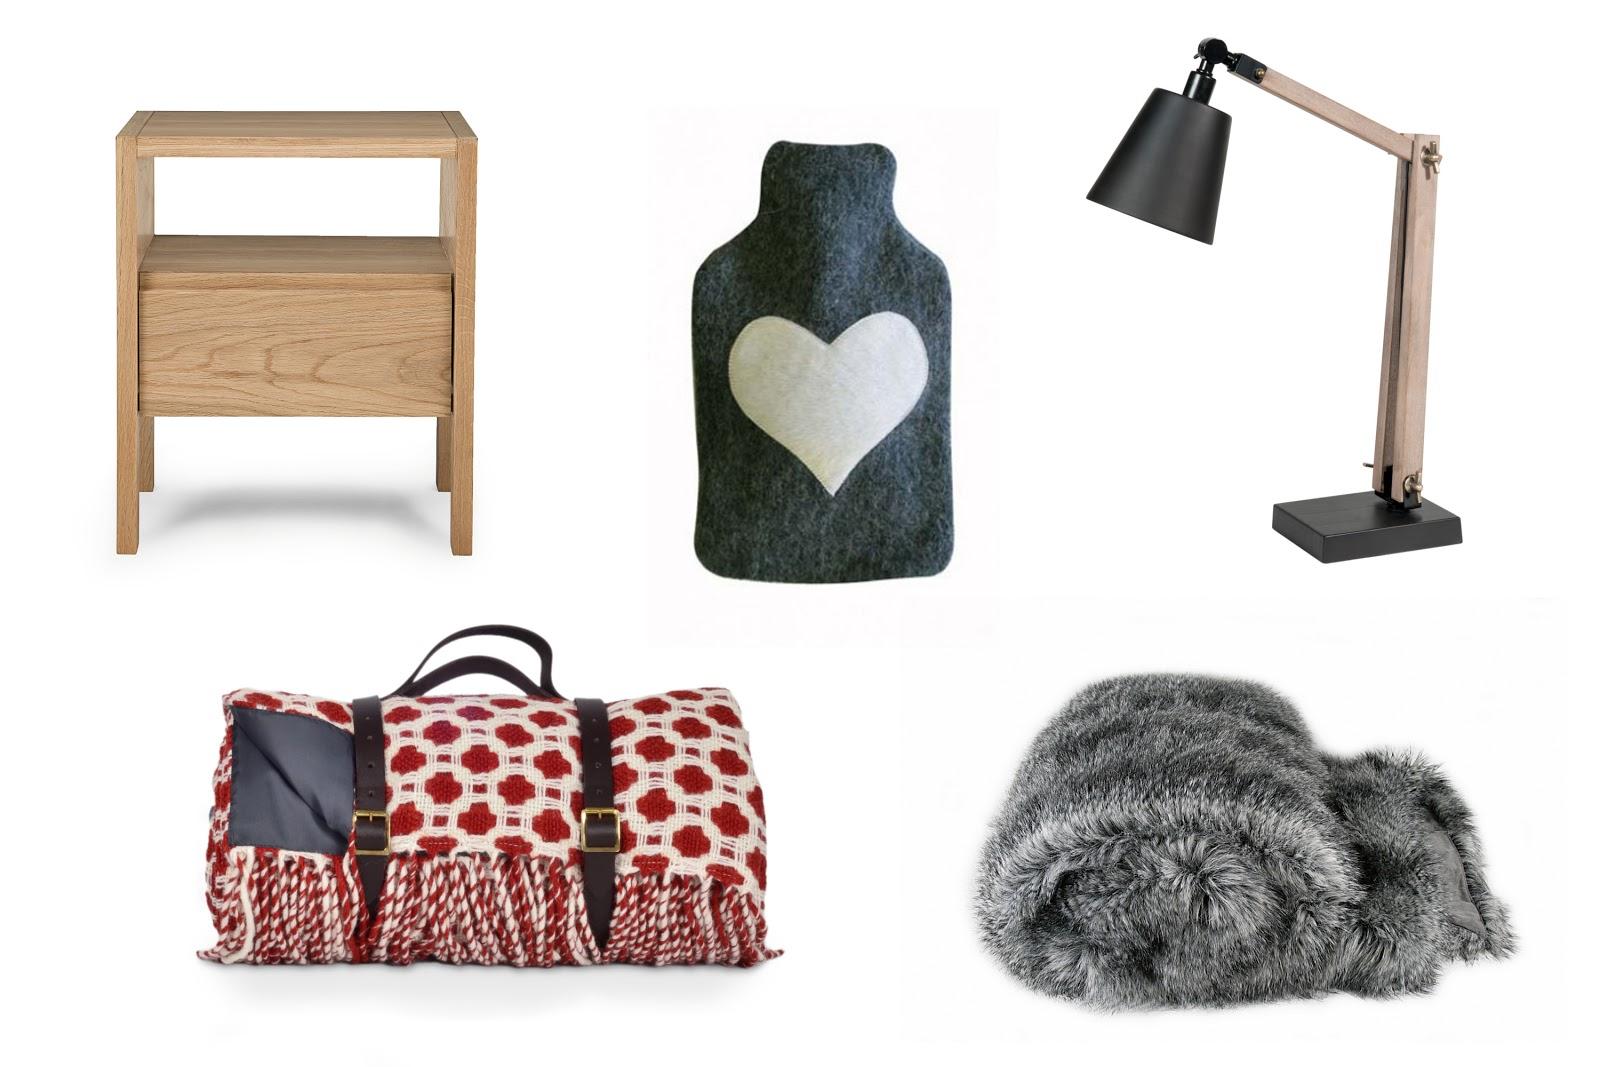 rue rivoirette shopping deco douce nuit. Black Bedroom Furniture Sets. Home Design Ideas